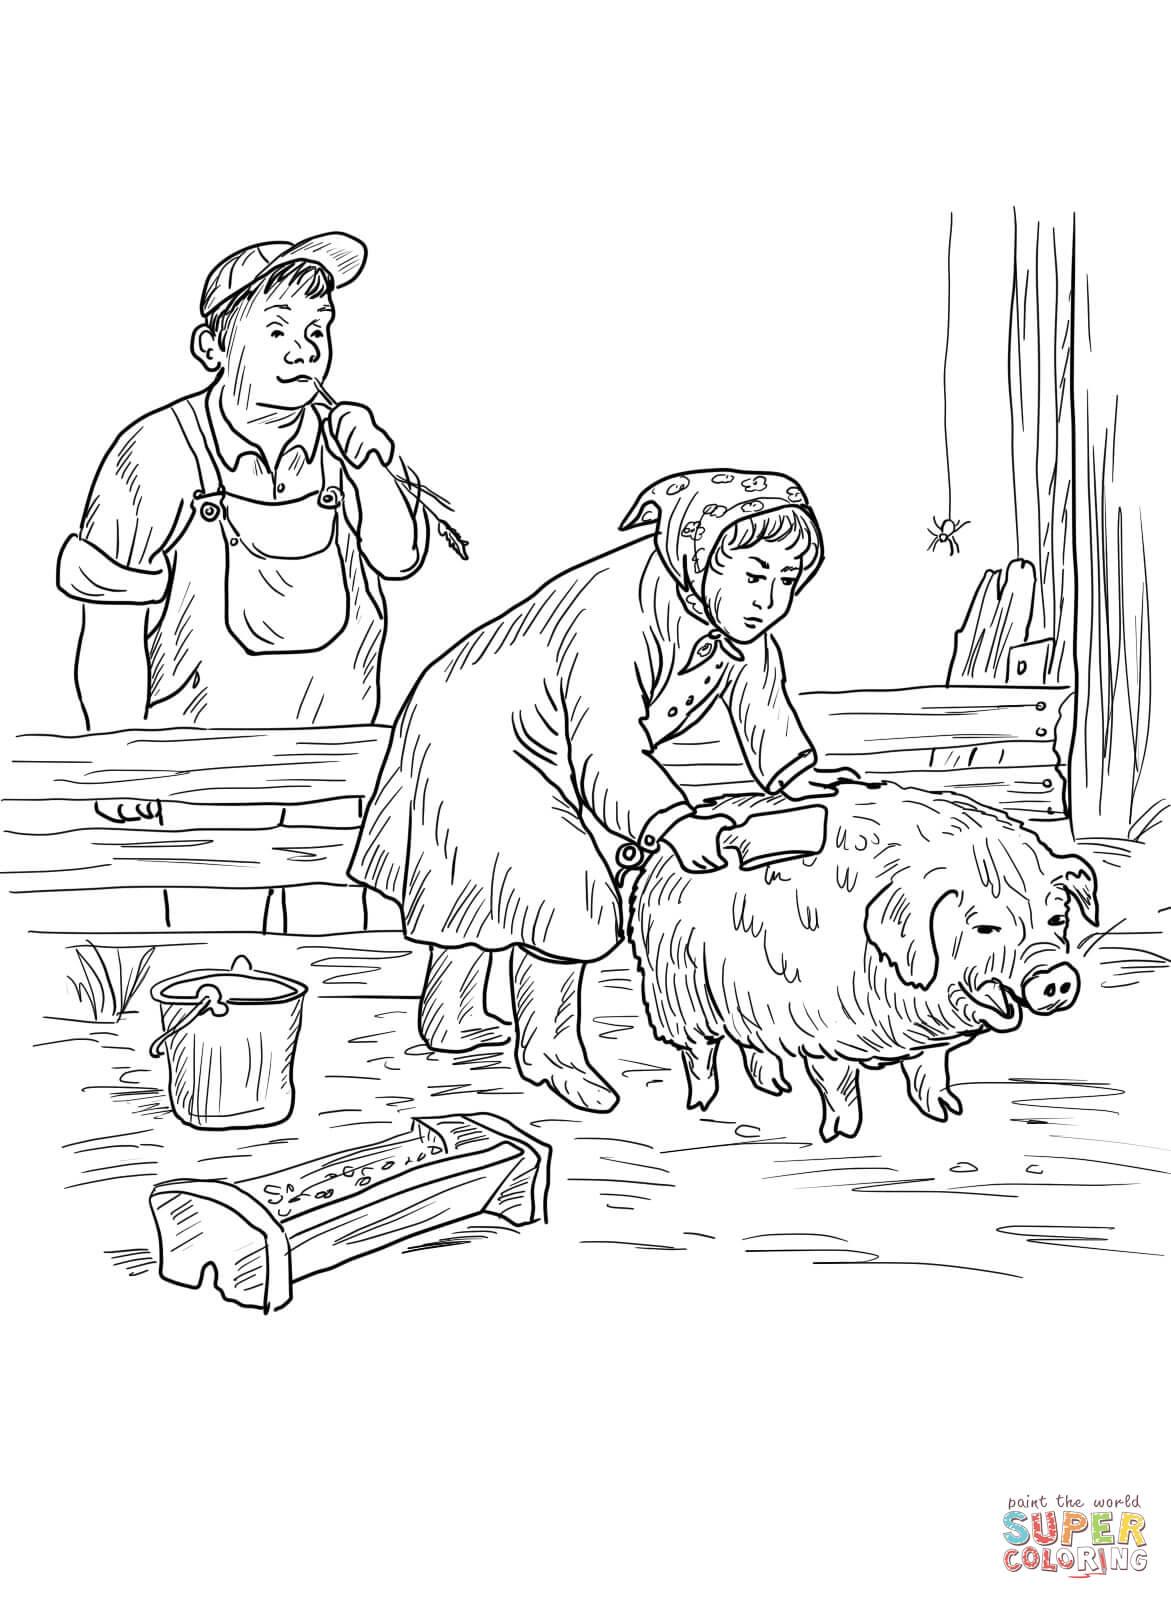 Mrs Zuckerman Gives Wilbur A Buttermilk Bath Coloring